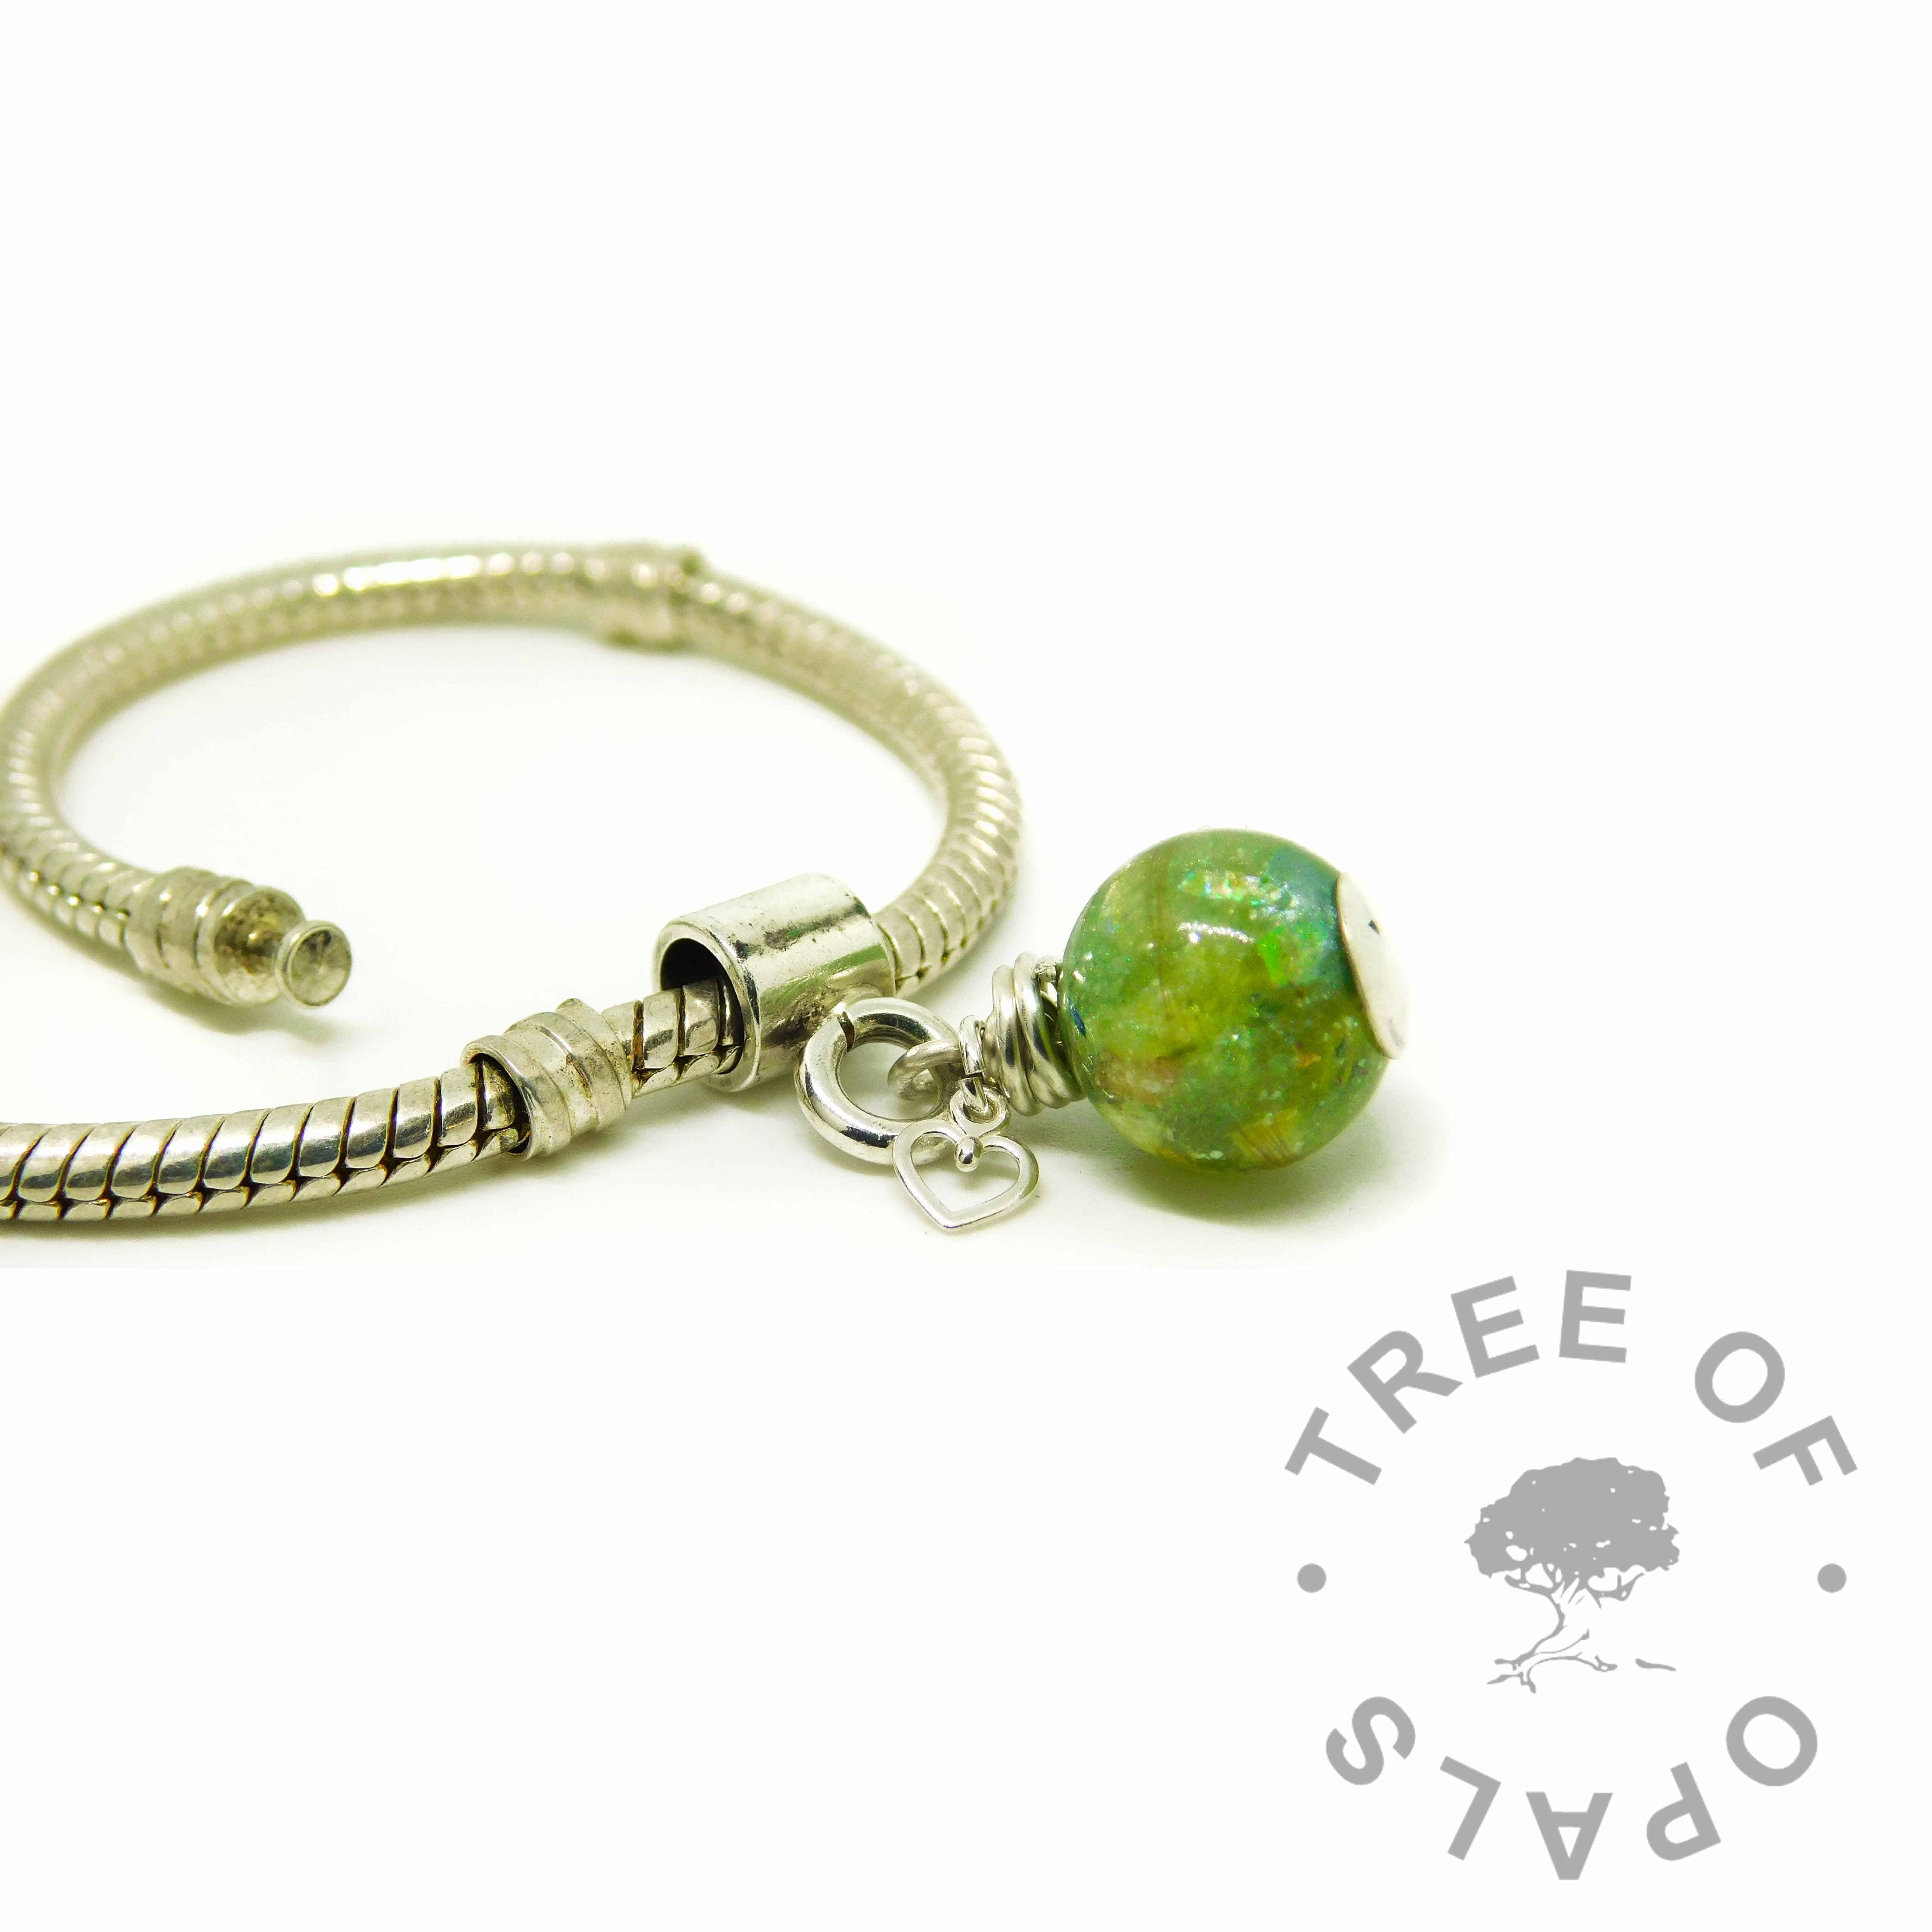 basilisk green lock of hair pearl with European charm setting for Pandora bracelets. Shown on a bracelet